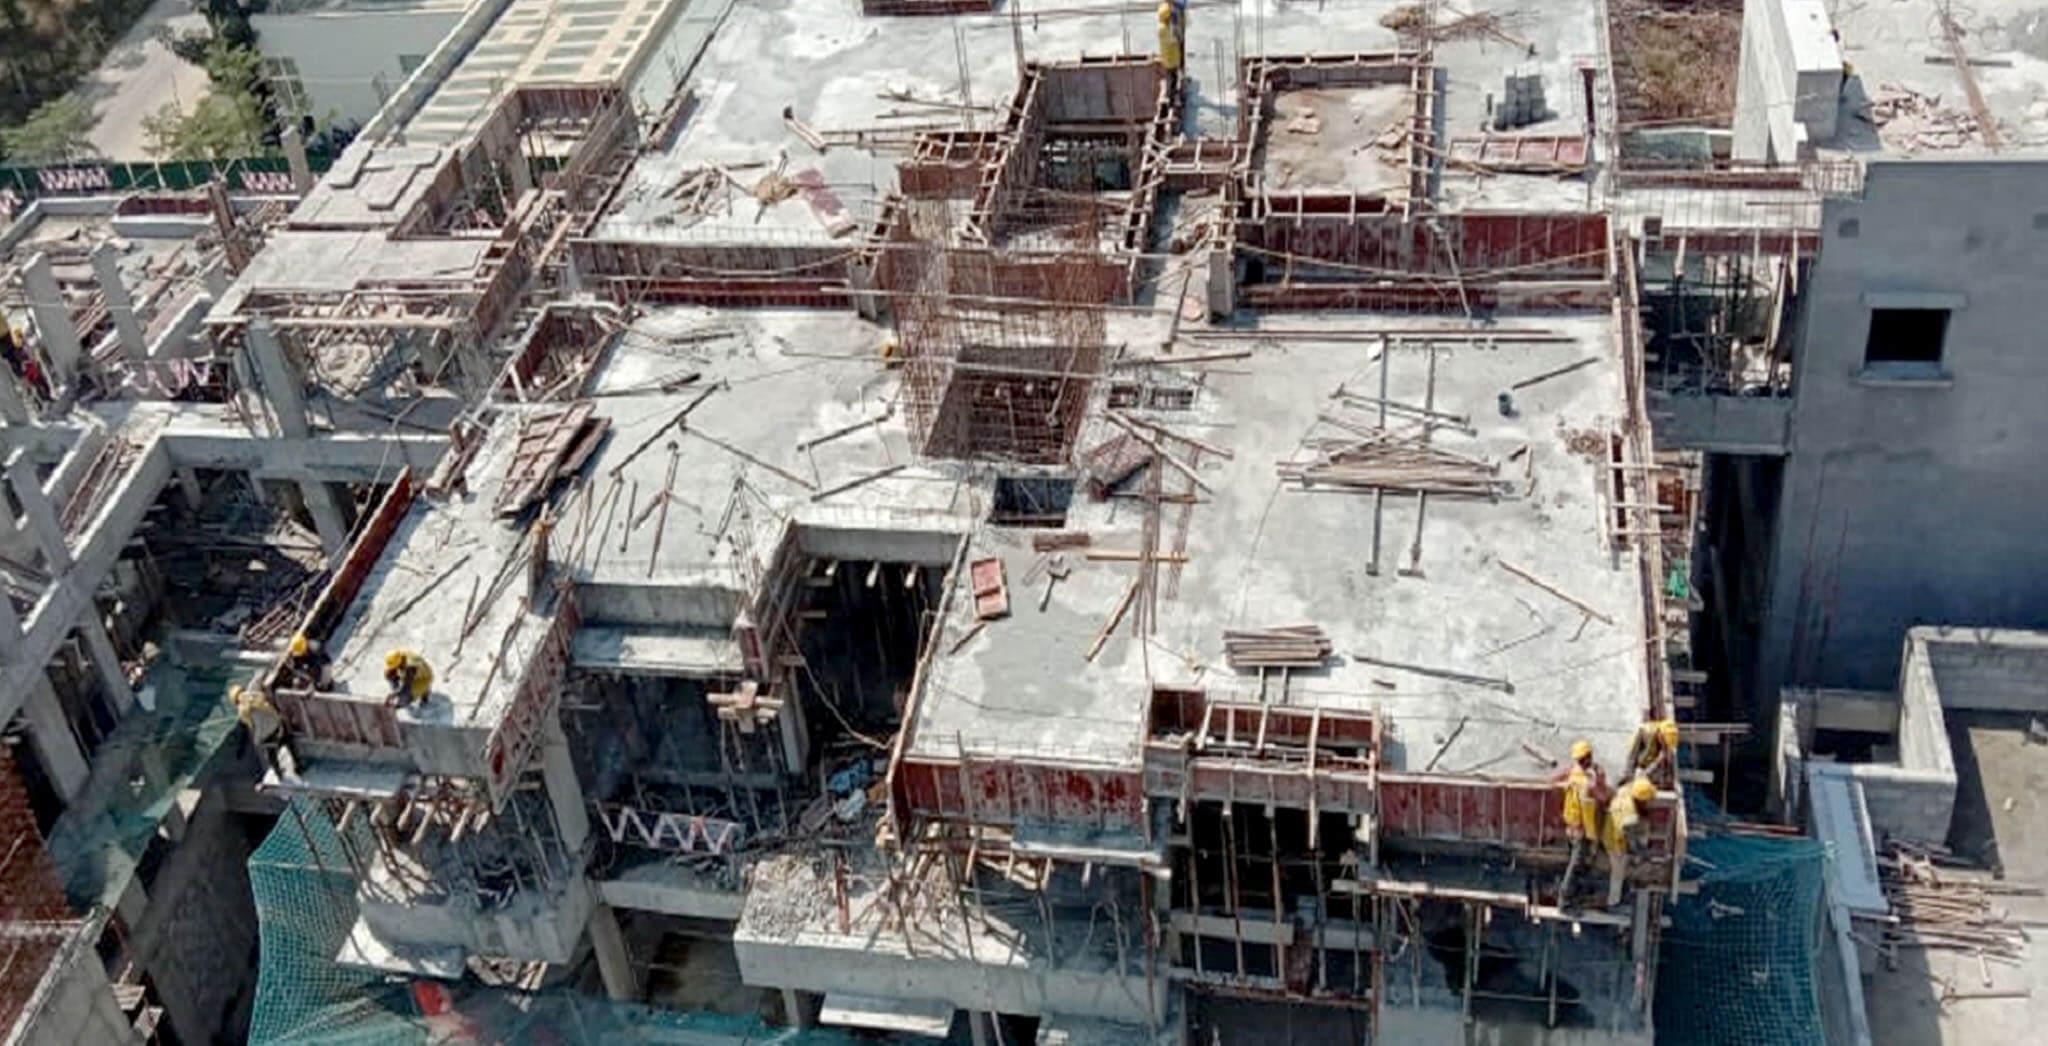 Feb 2021 - Casting of D Block Terrace slab milestone, 24th February 2021